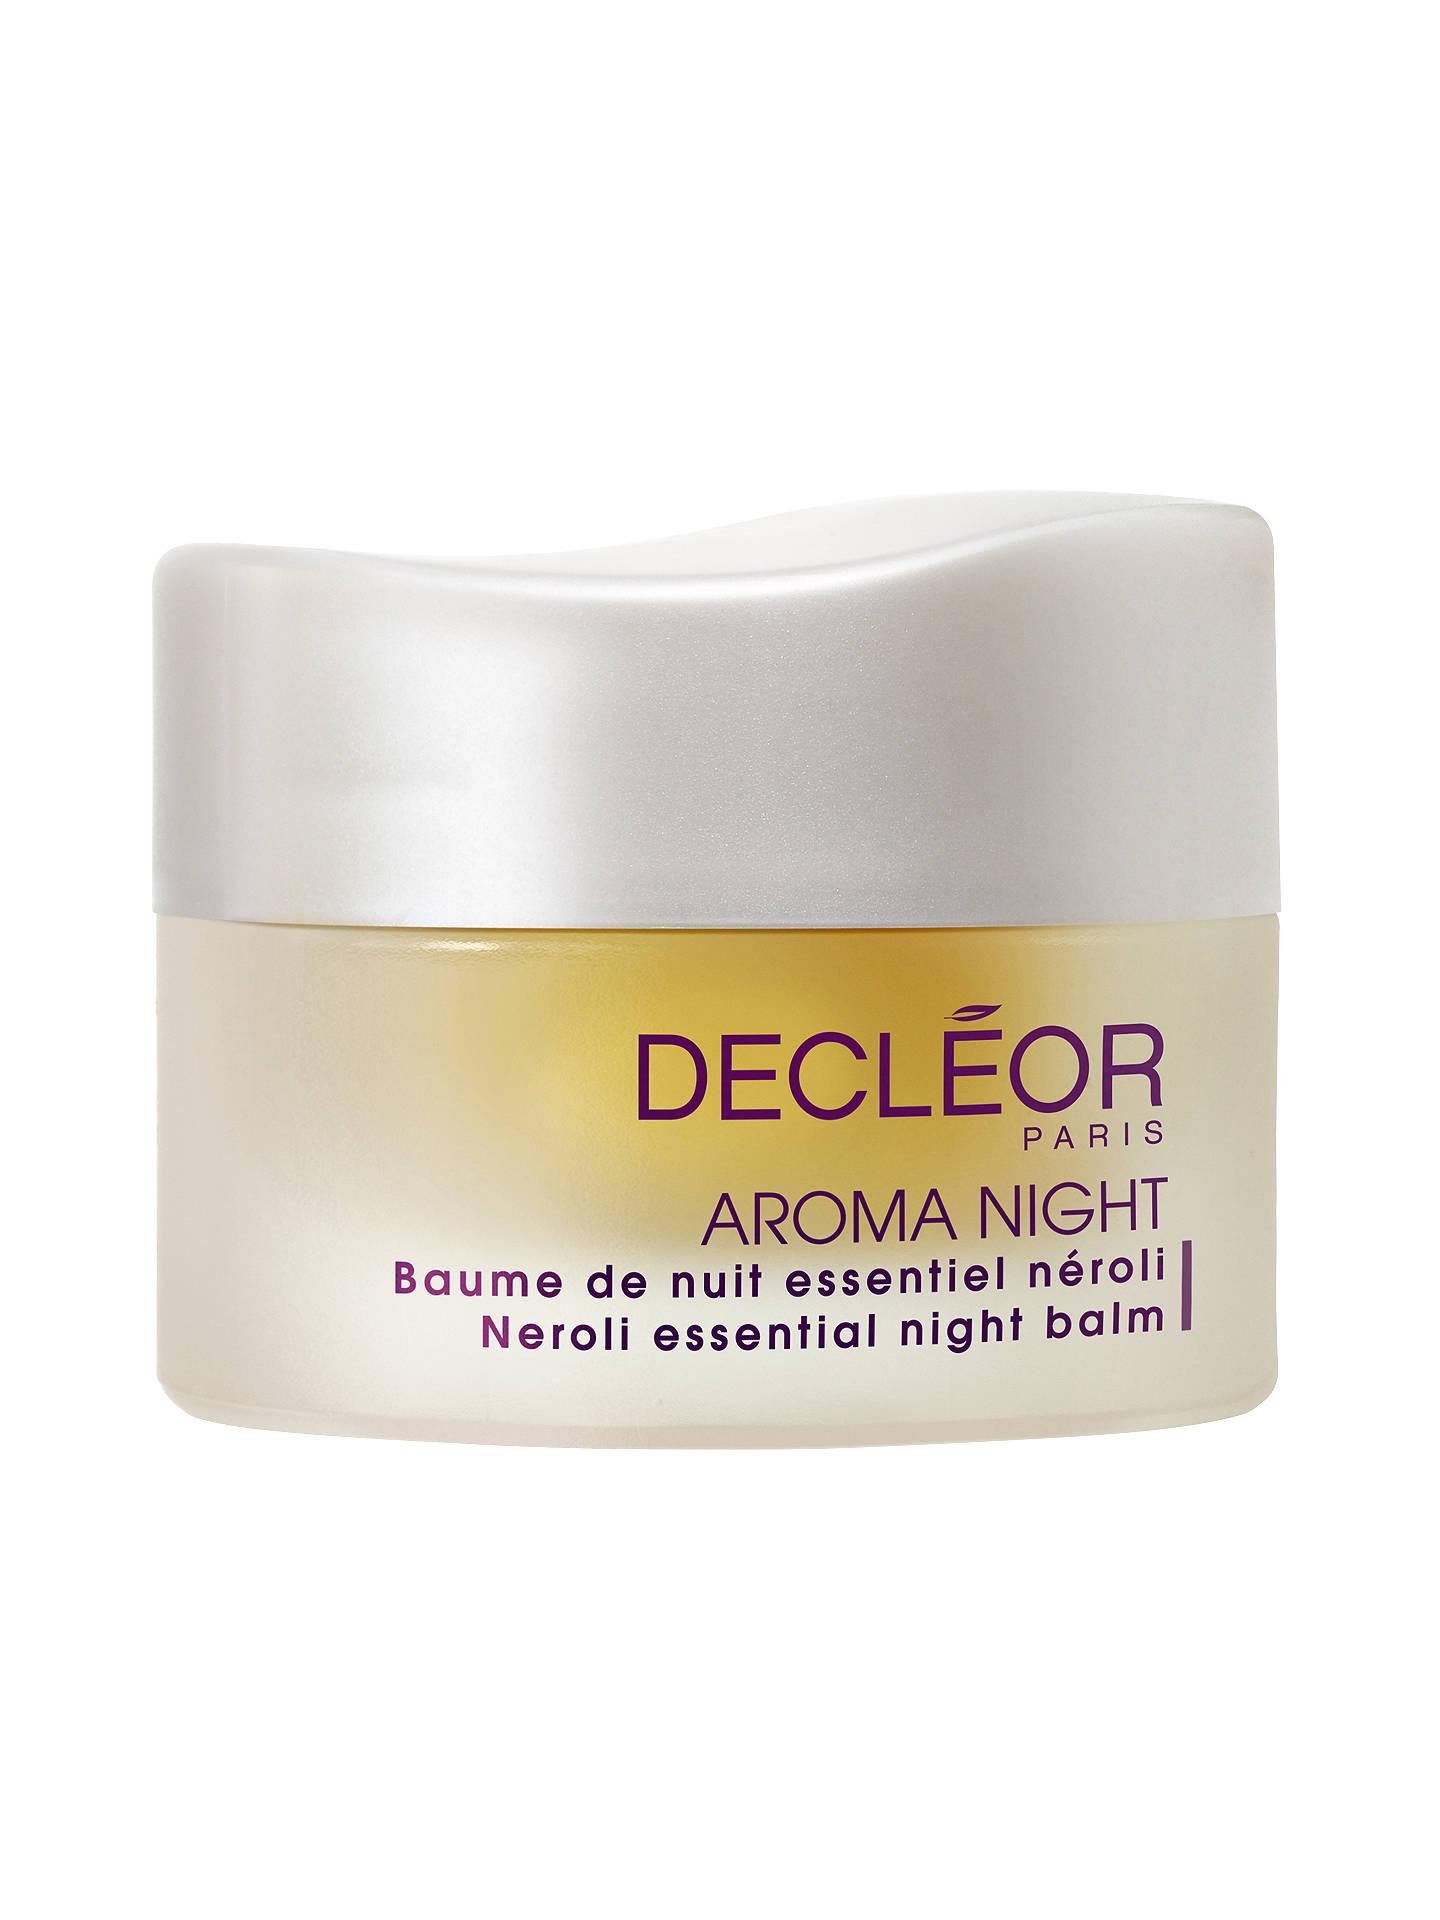 decleor neroli night balm